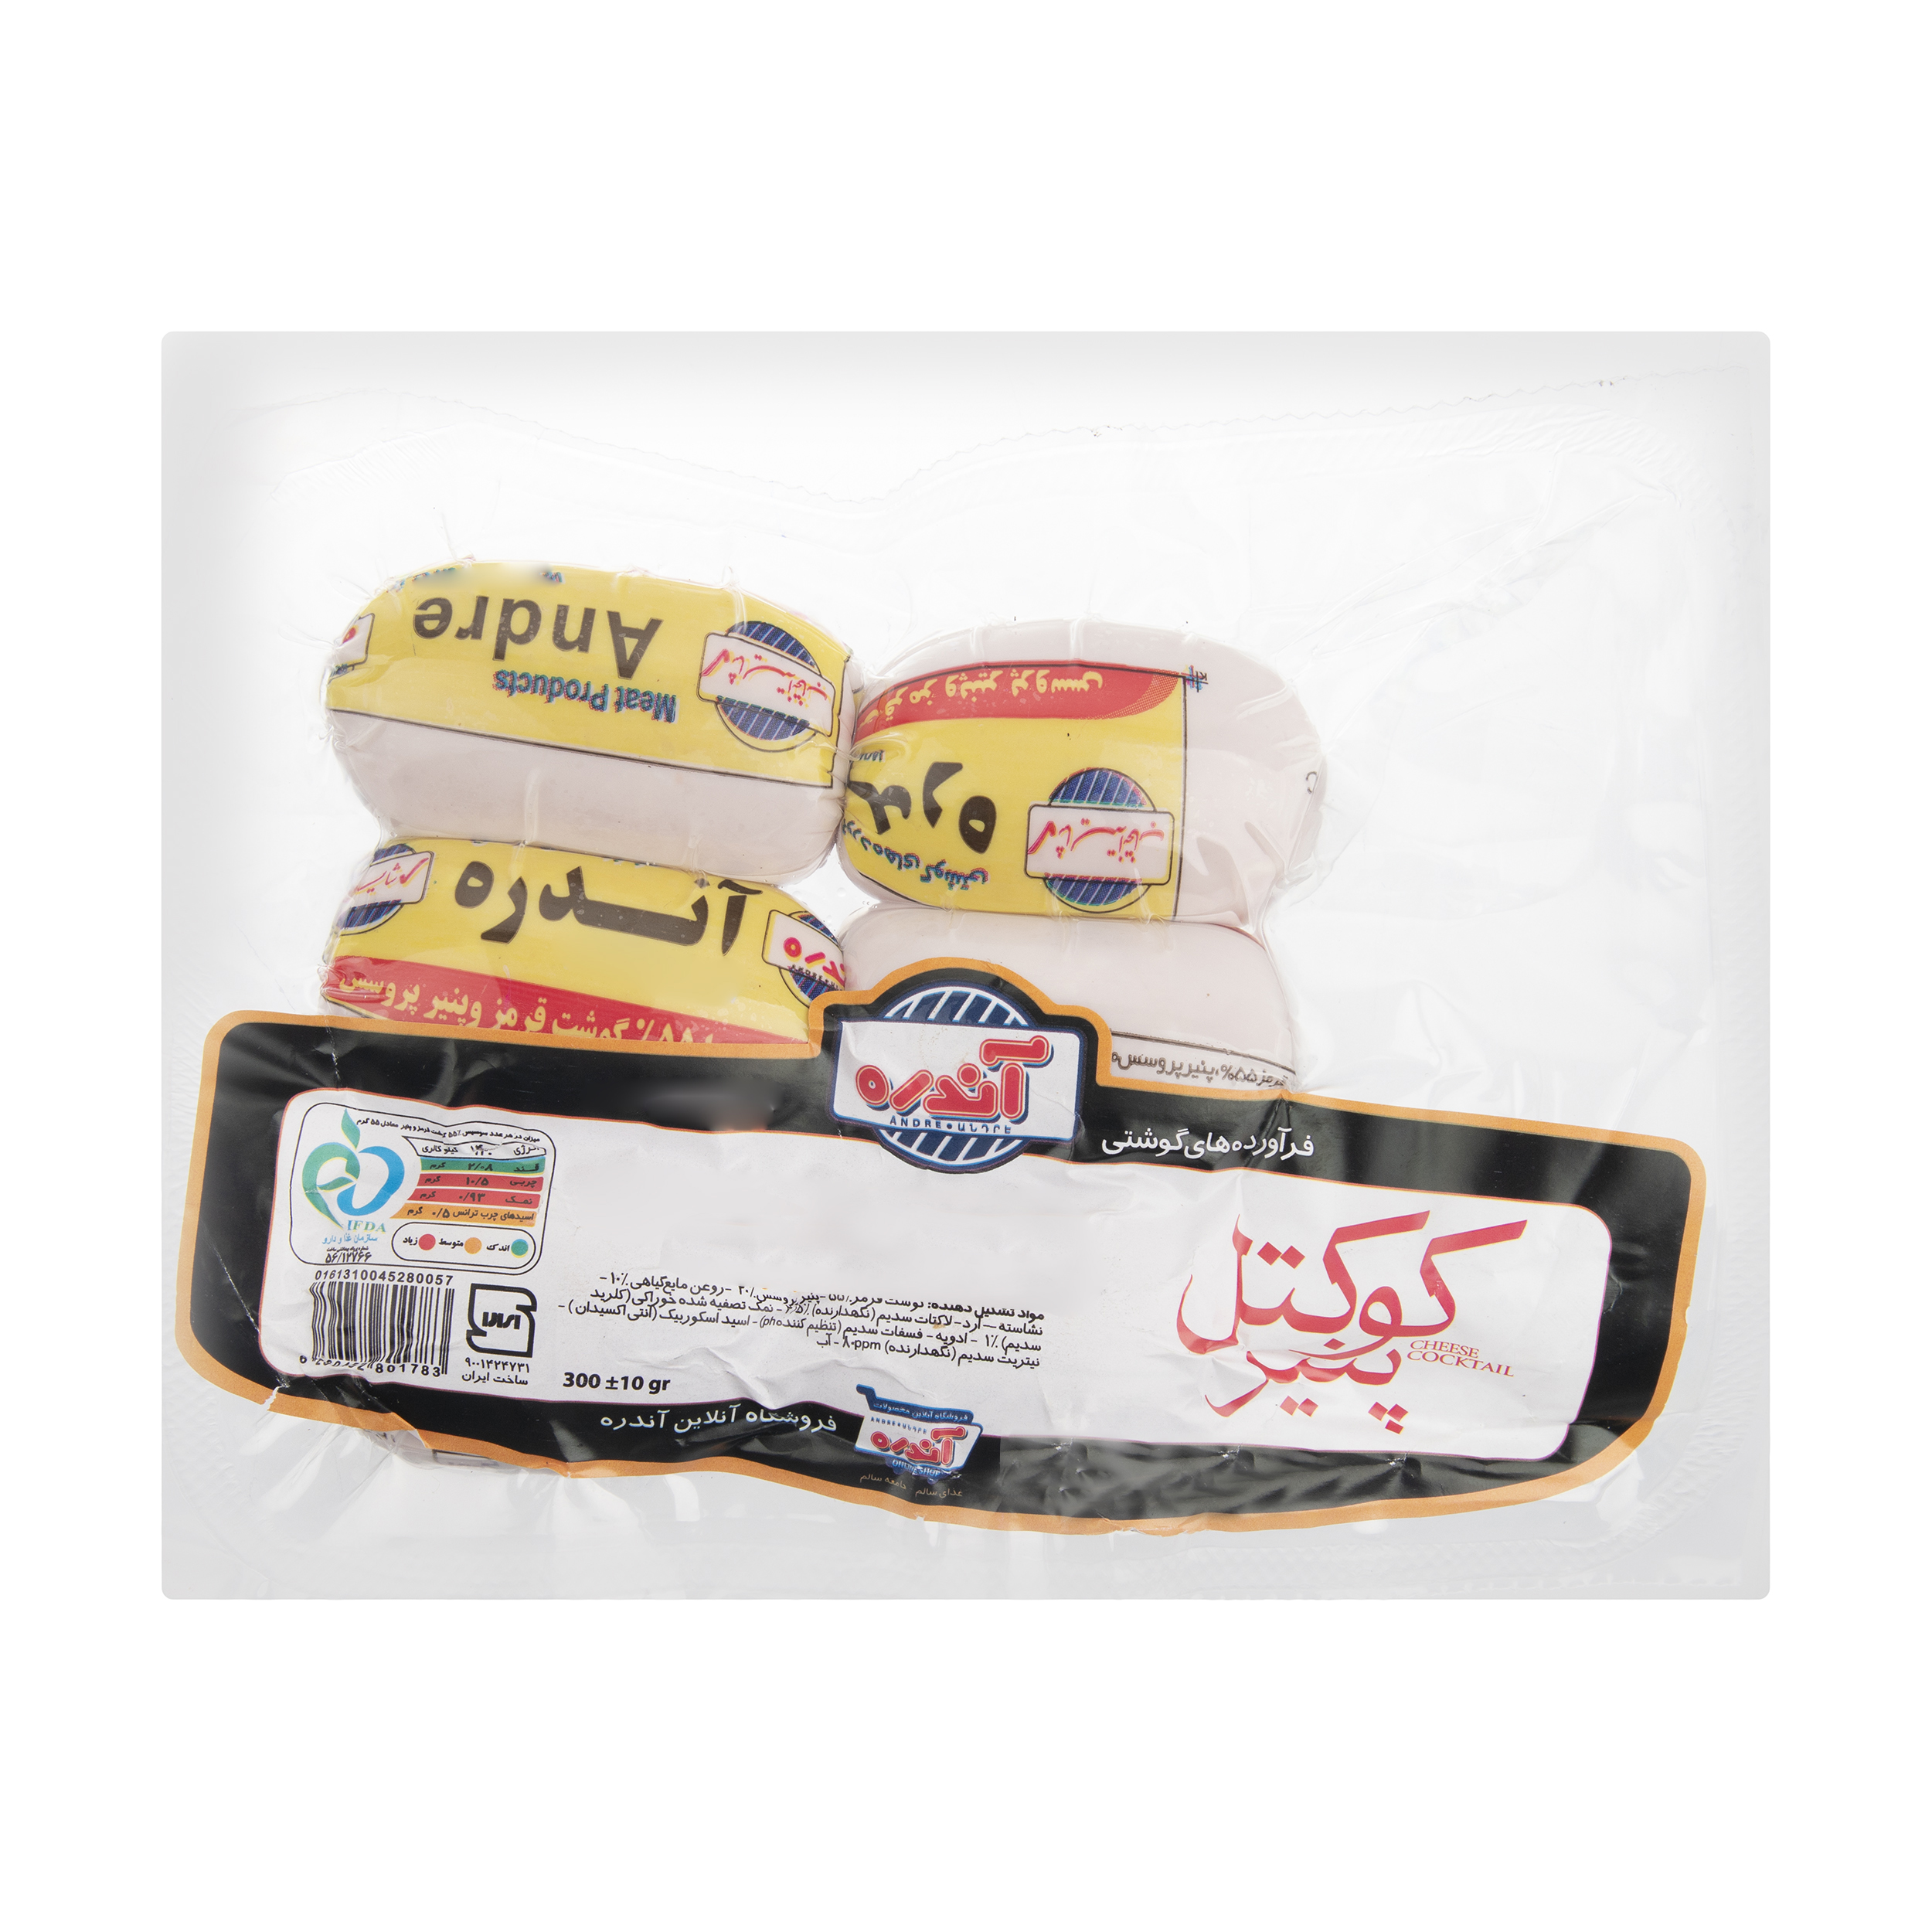 کوکتل پنیر 55 درصد گوشت قرمز و پنیر پروسس آندره - 300 گرم